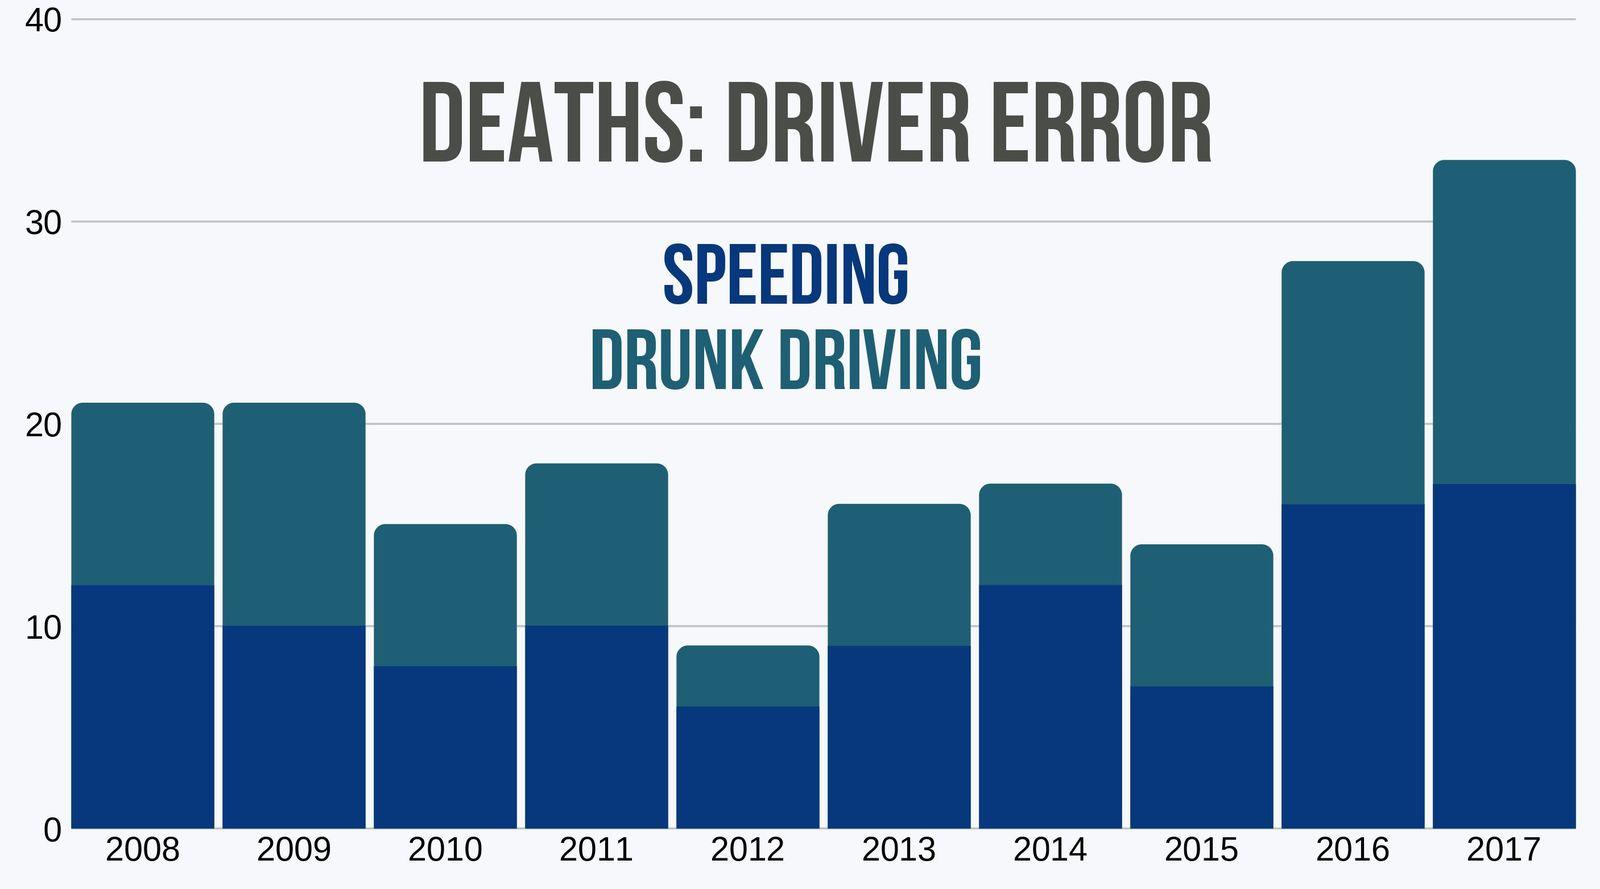 Deaths in DC by speeding or drunk driving 10 year trend